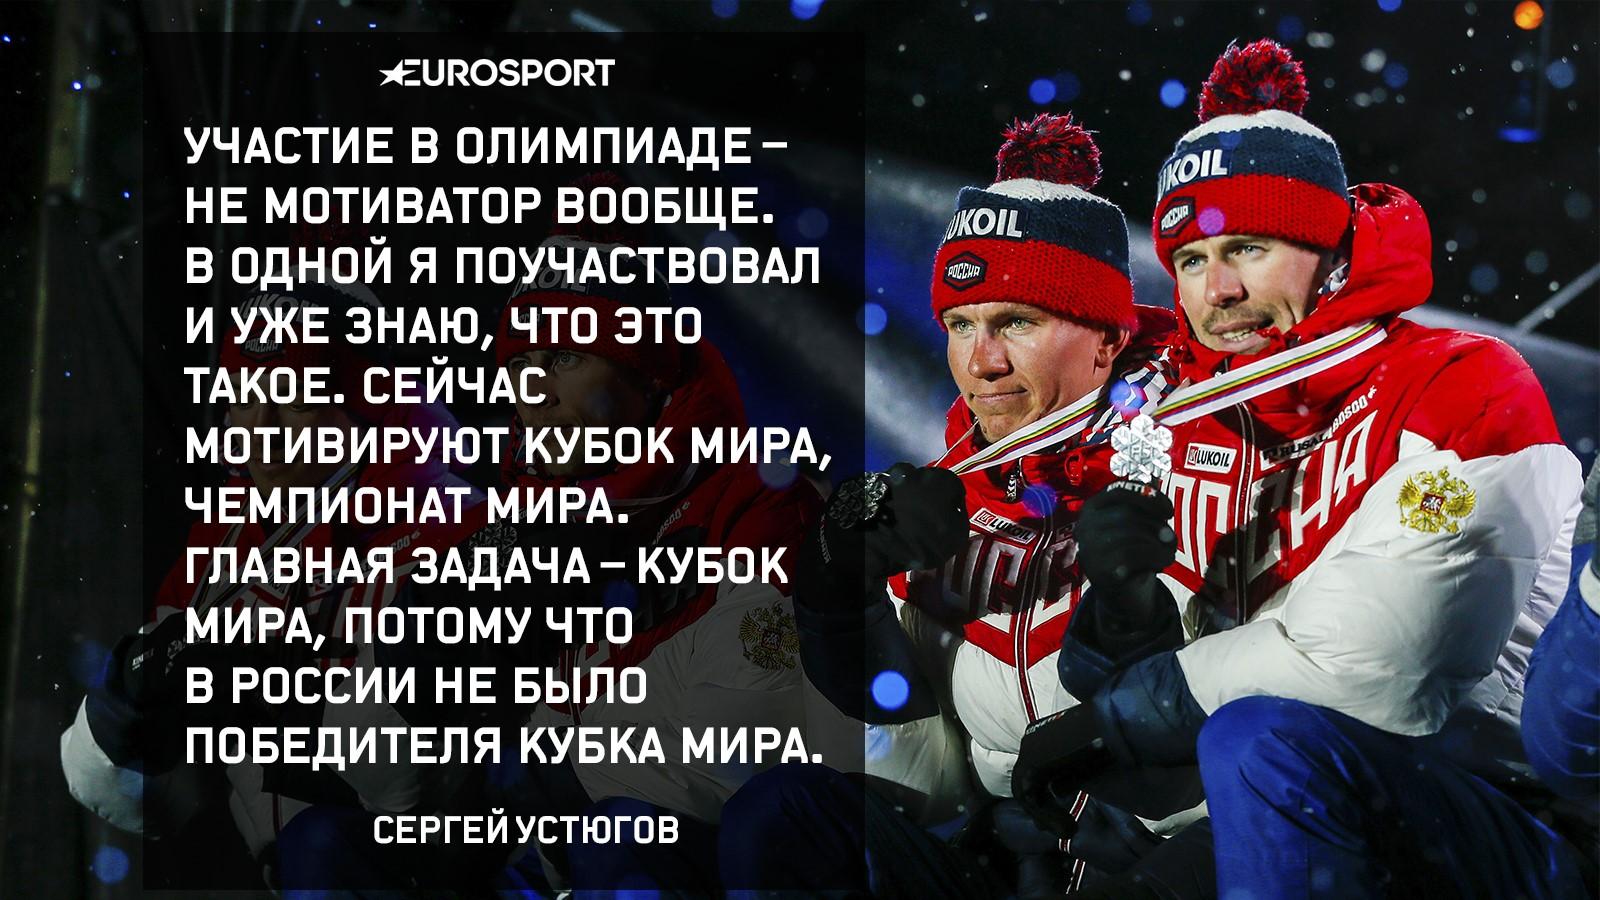 https://i.eurosport.com/2019/11/05/2710584.jpg